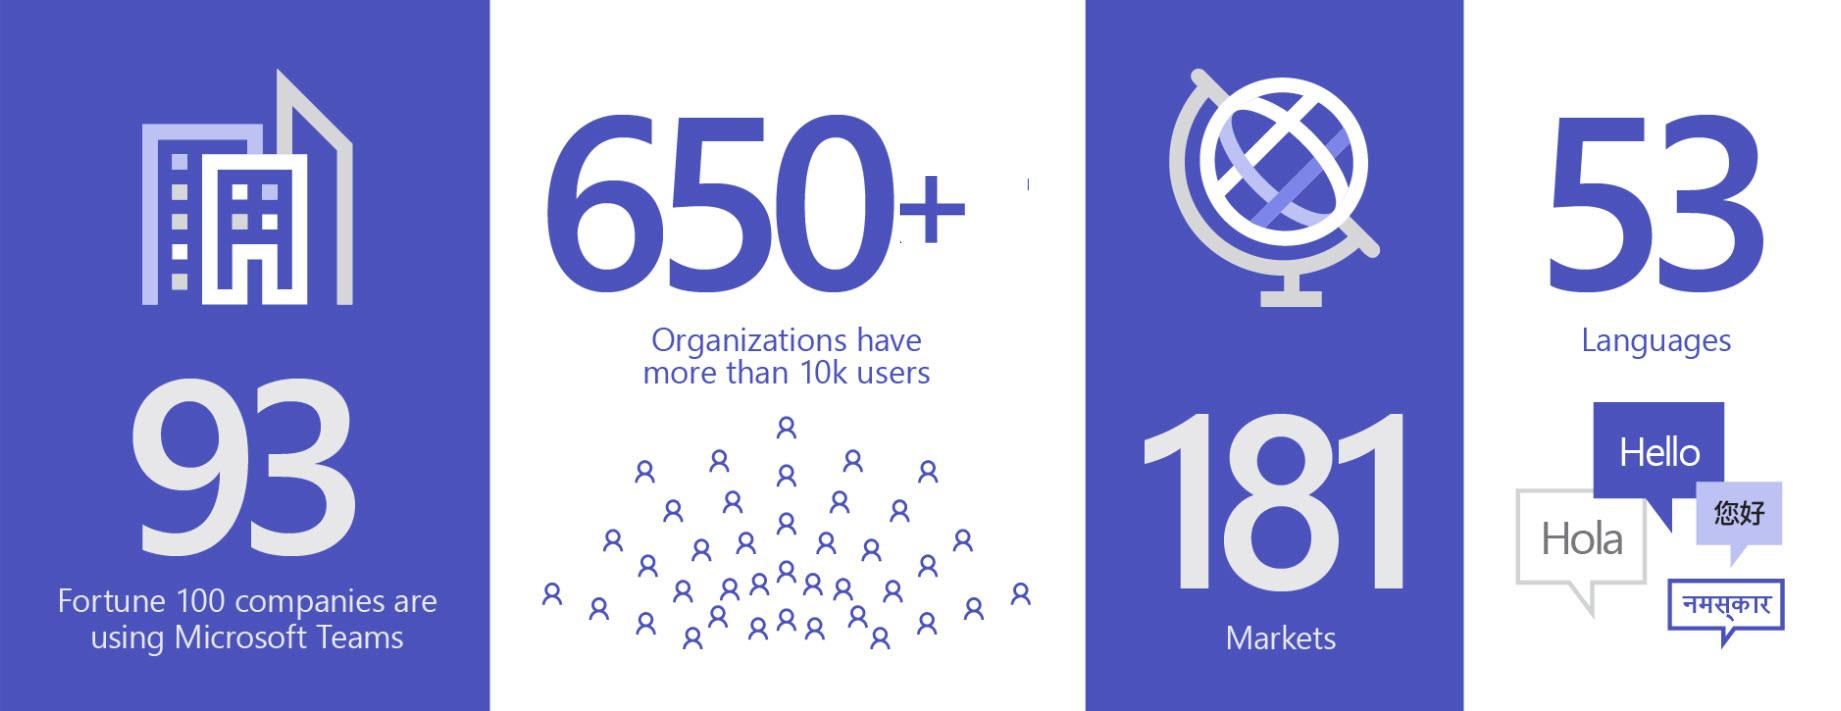 Teams를 사용하는 93개 조직을 보여 주는 이미지. 사용자 수가 1만 명이 넘는 조직이 181개 시장, 53개 언어에 걸쳐 650개 이상입니다.